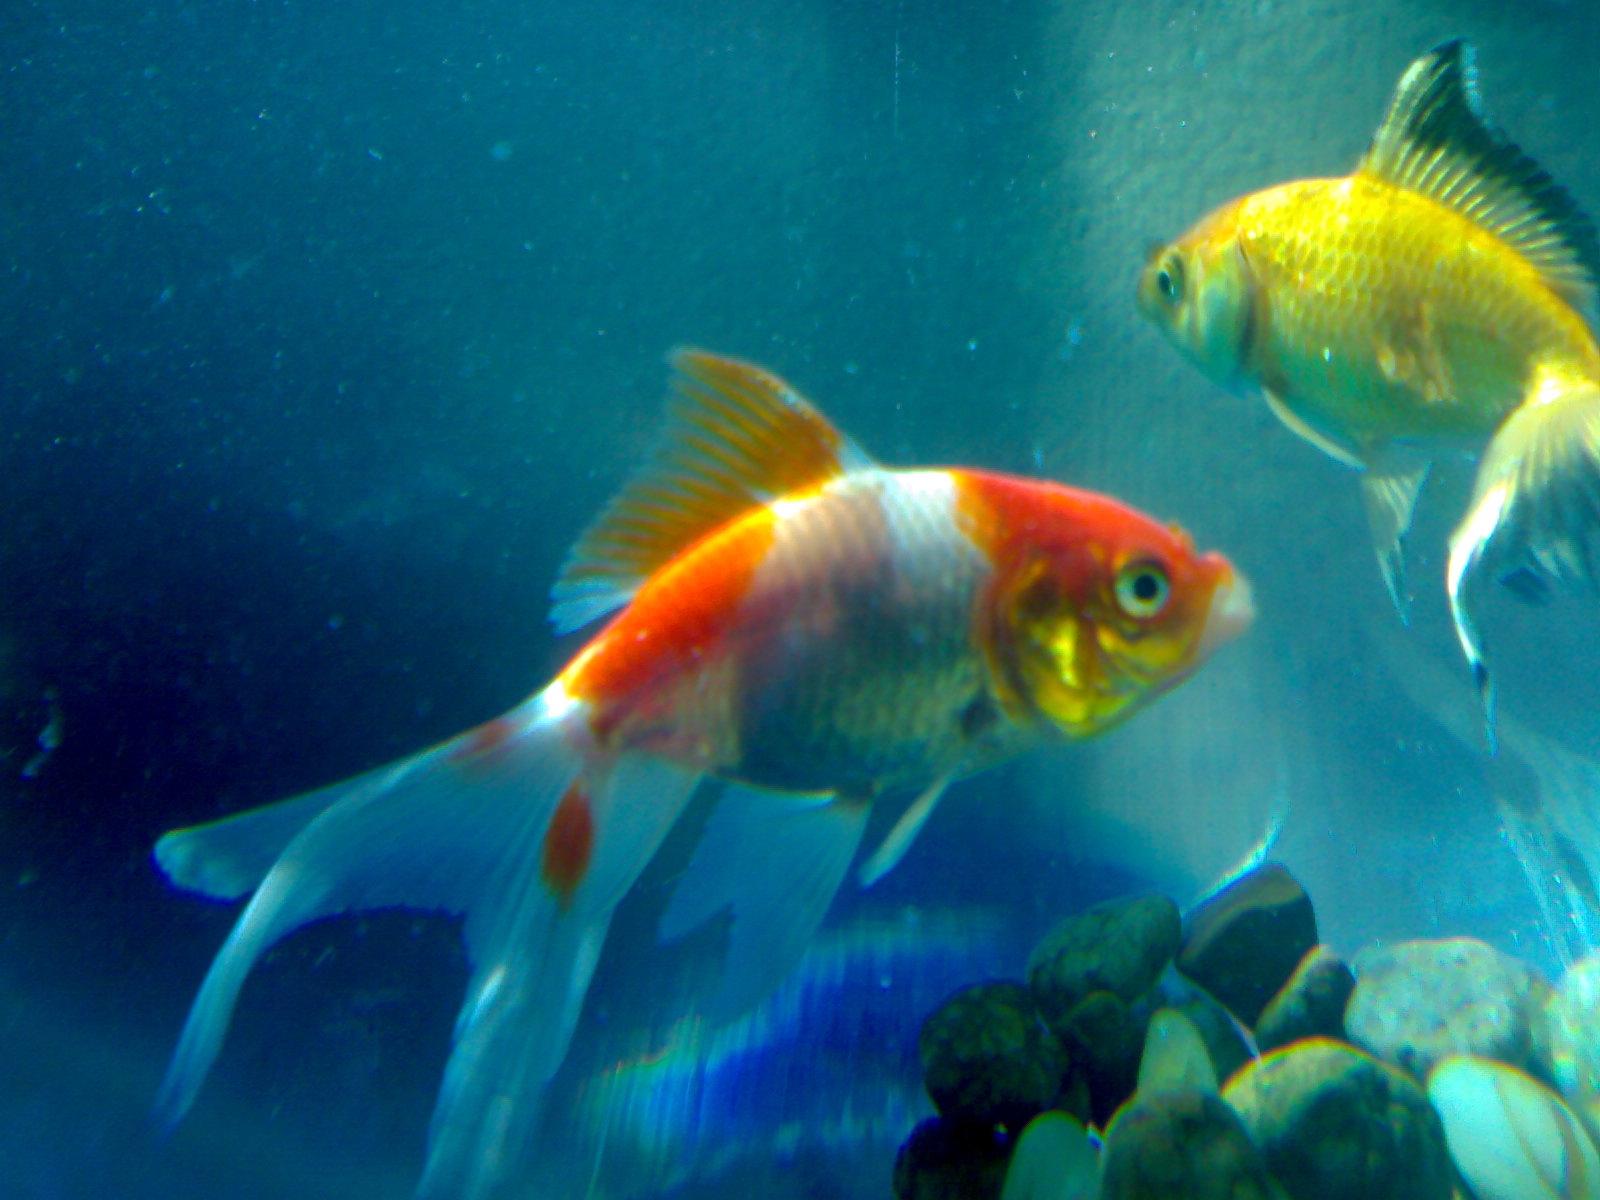 1600x1200 evil fish desktop - photo #14